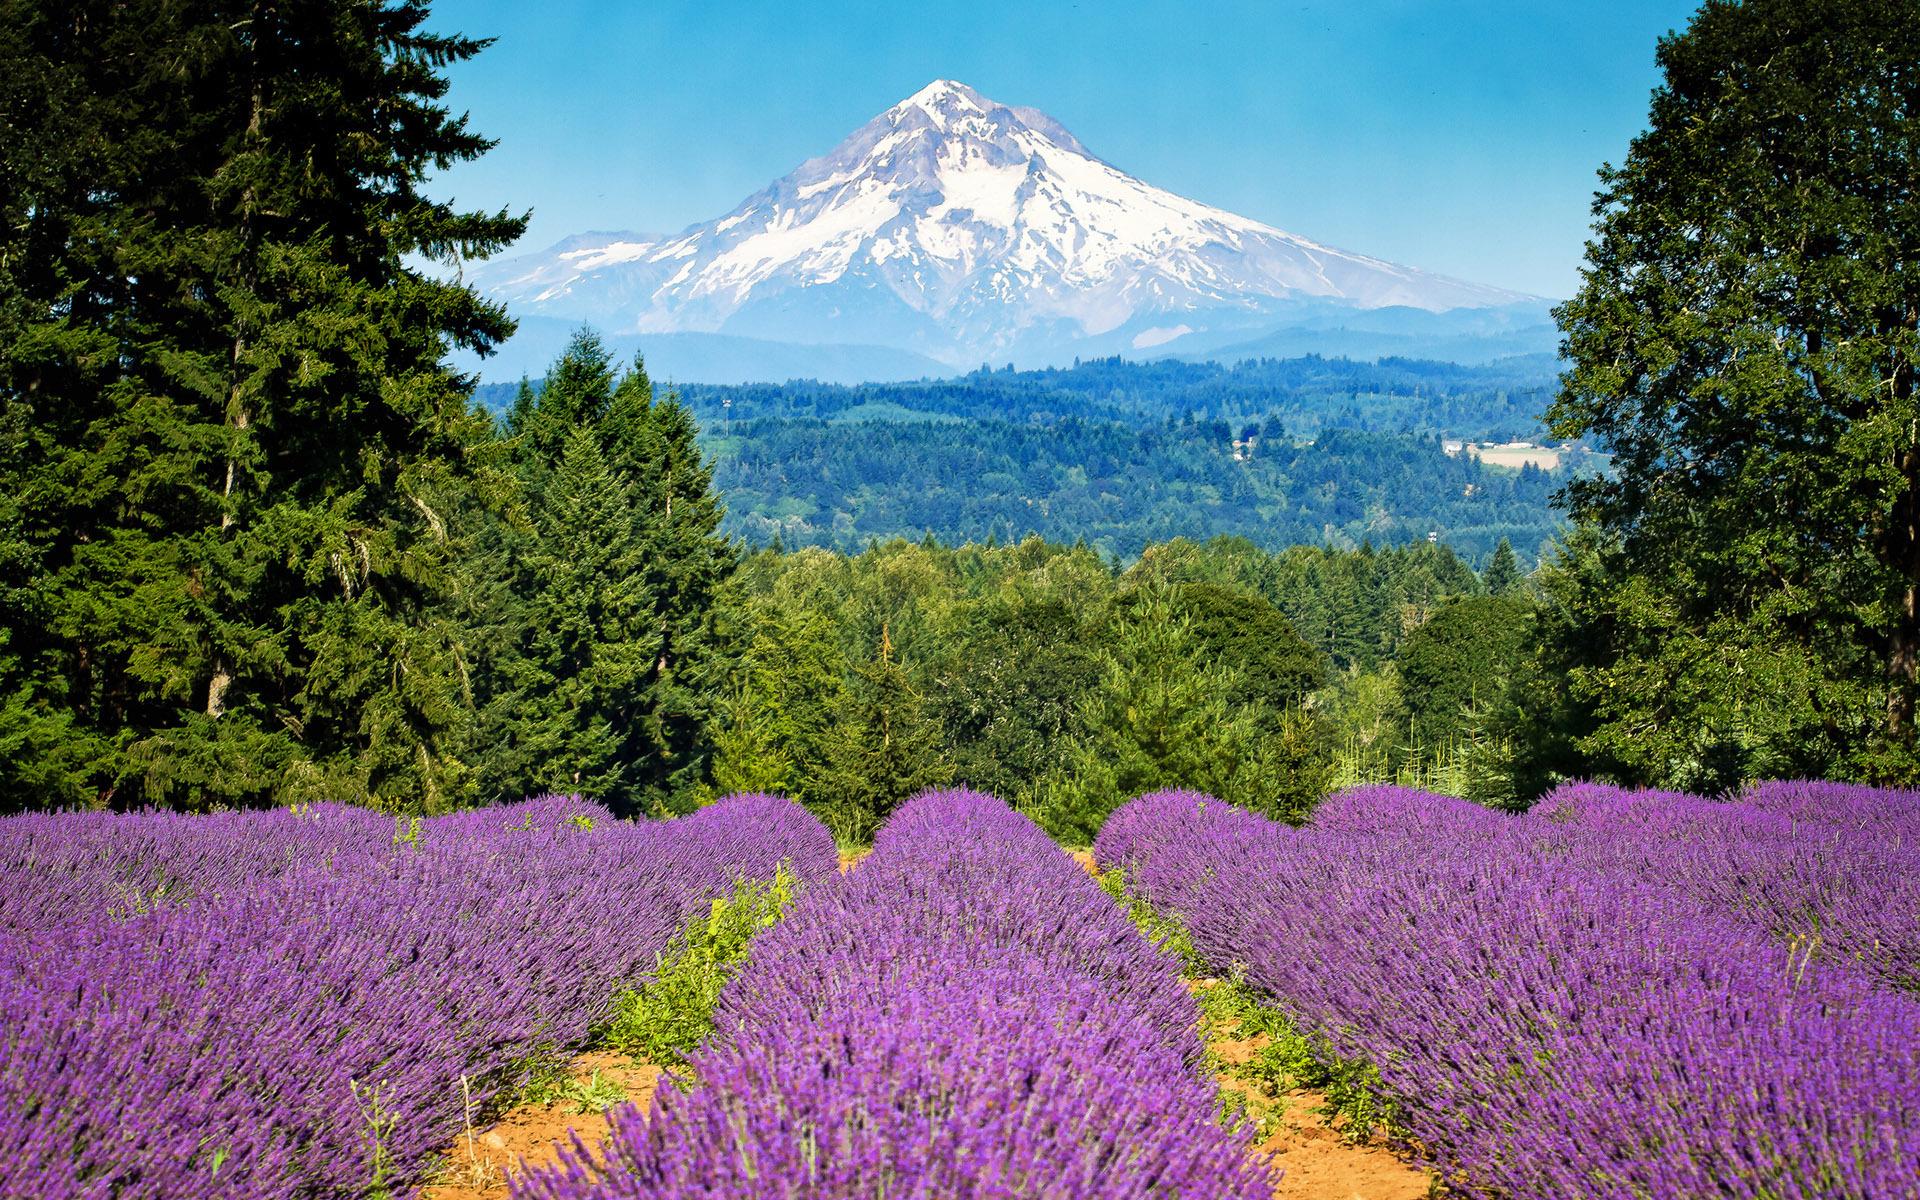 Lavender field wallpaper 28193 1920x1200